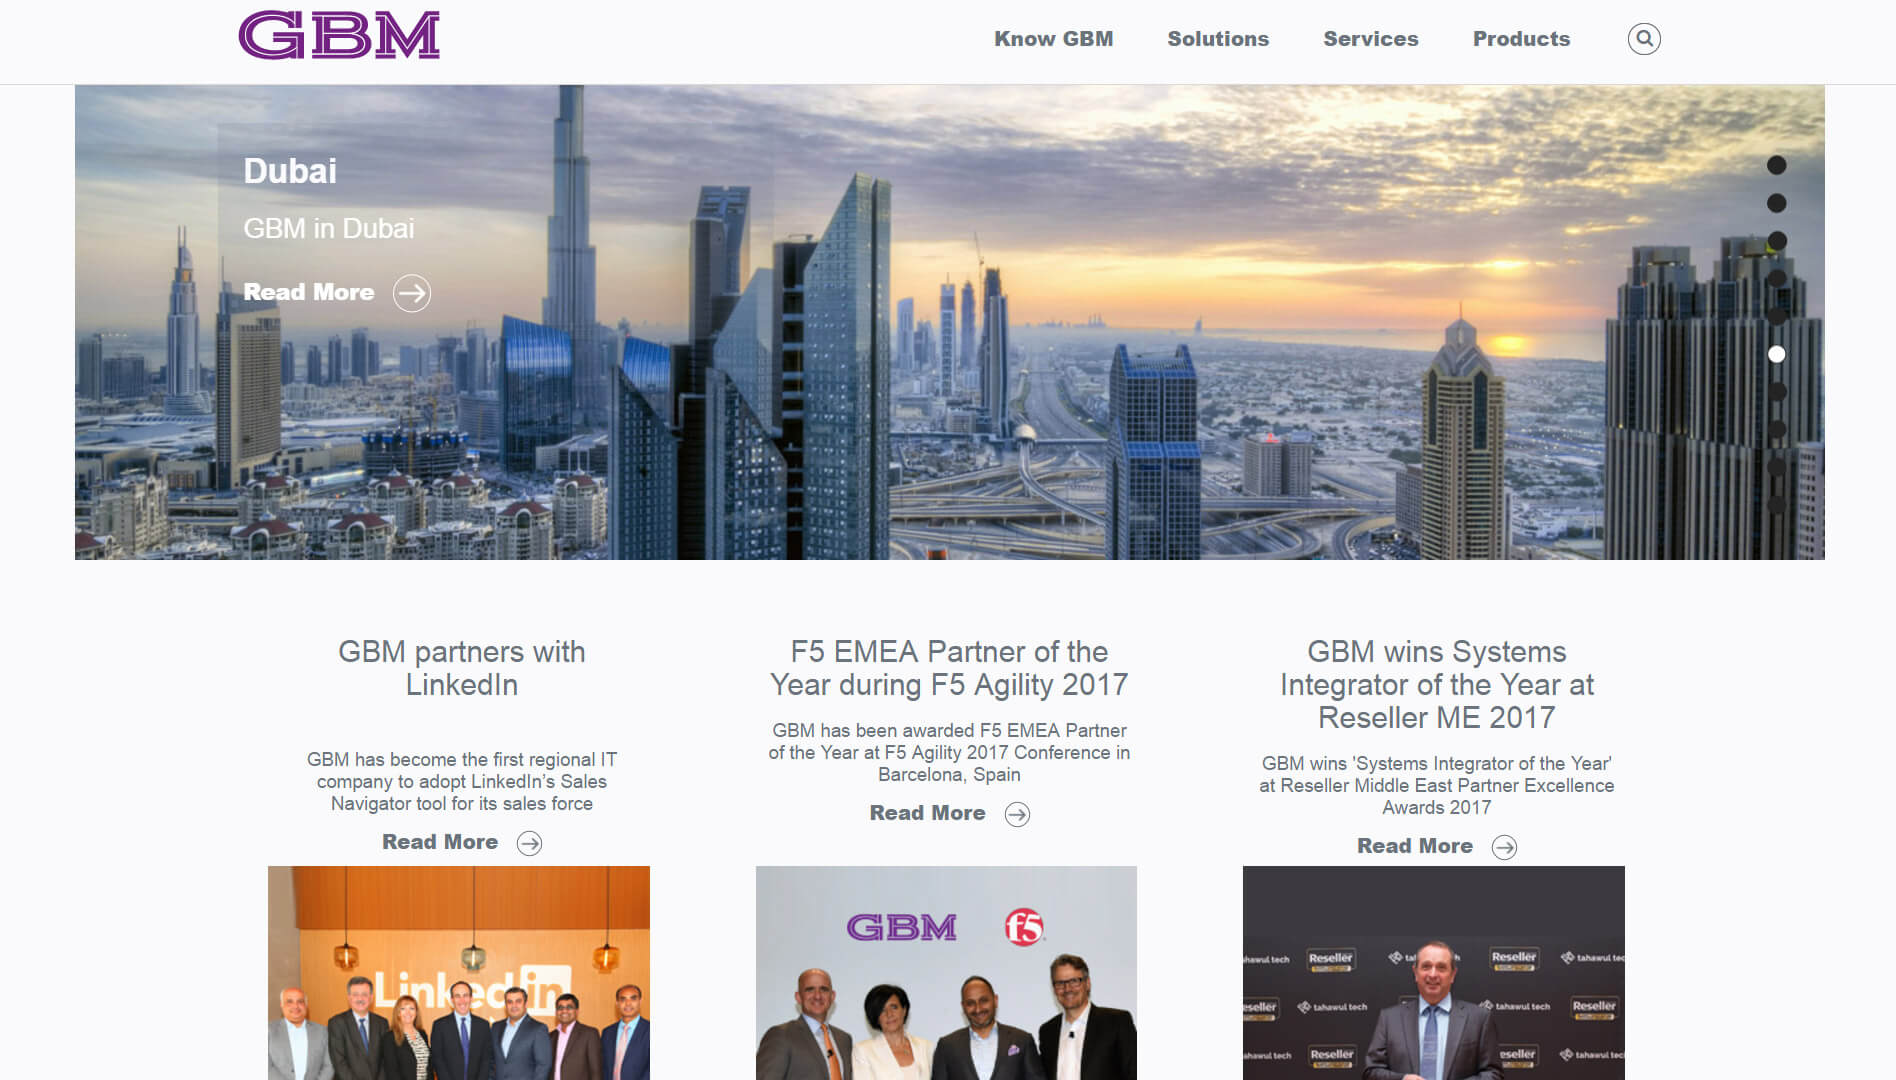 gbm homepage design